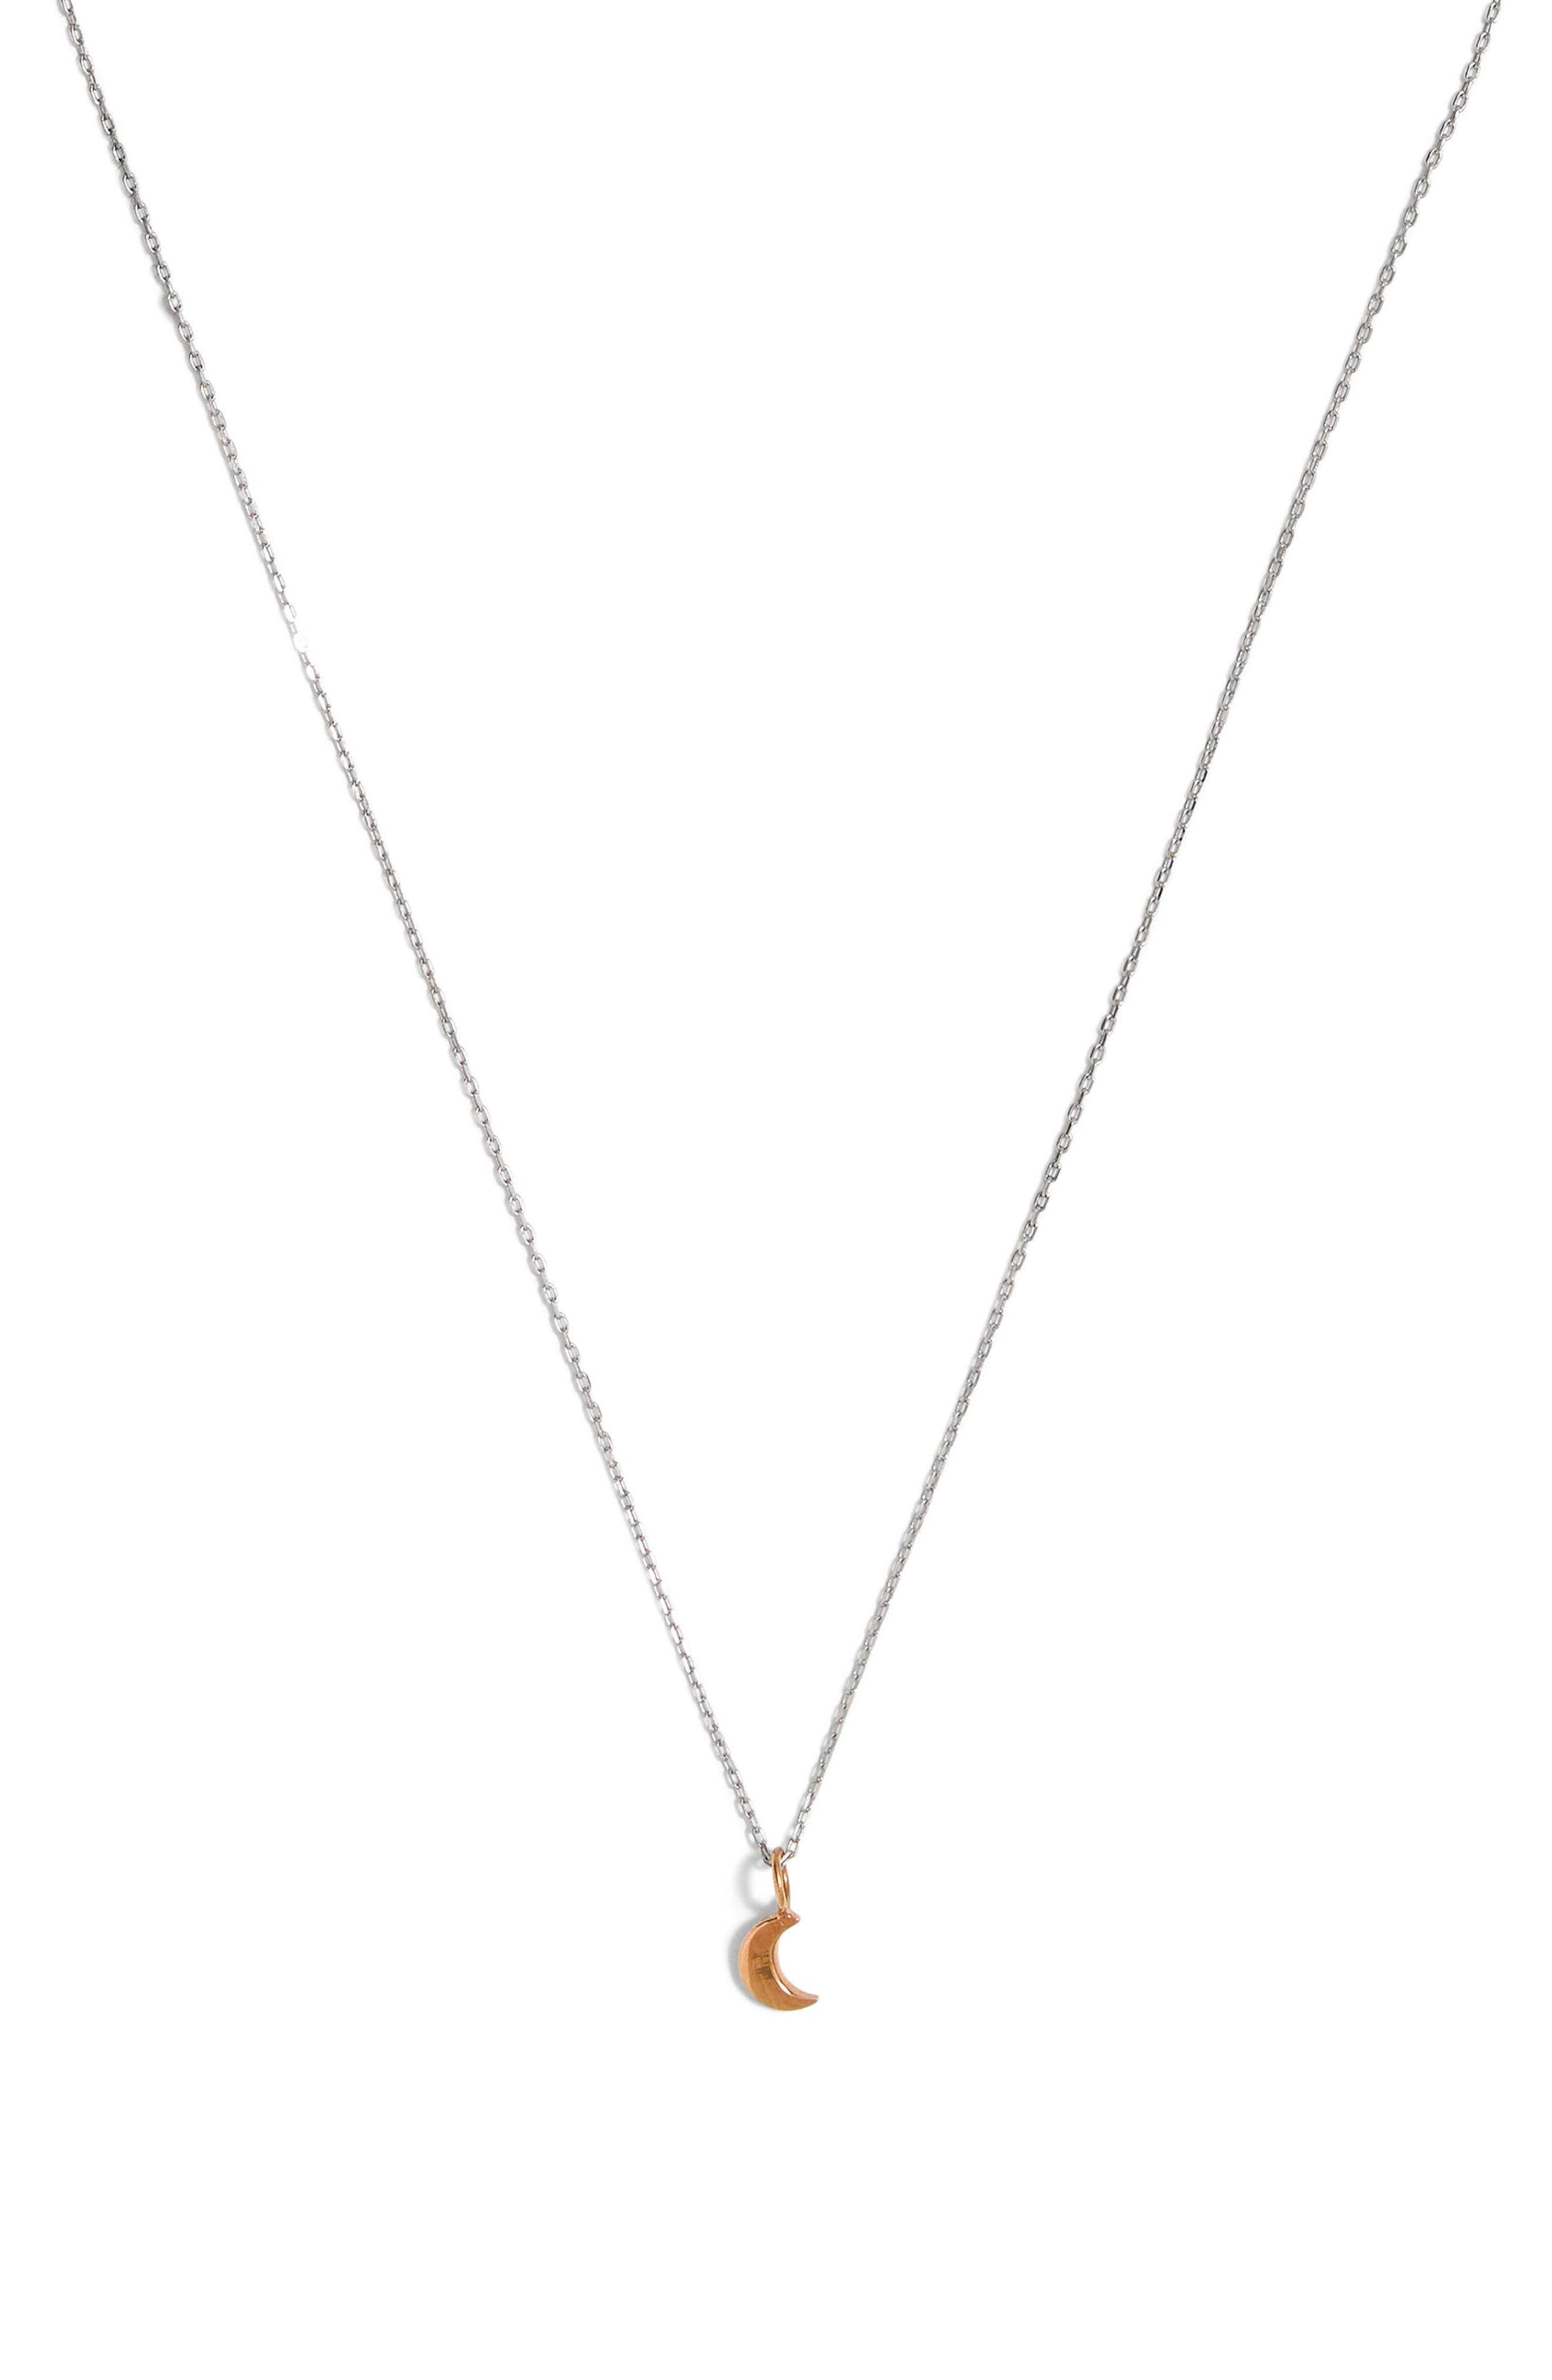 MADEWELL Vermeil Crescent Moon Charm Necklace, Main, color, VERMEIL